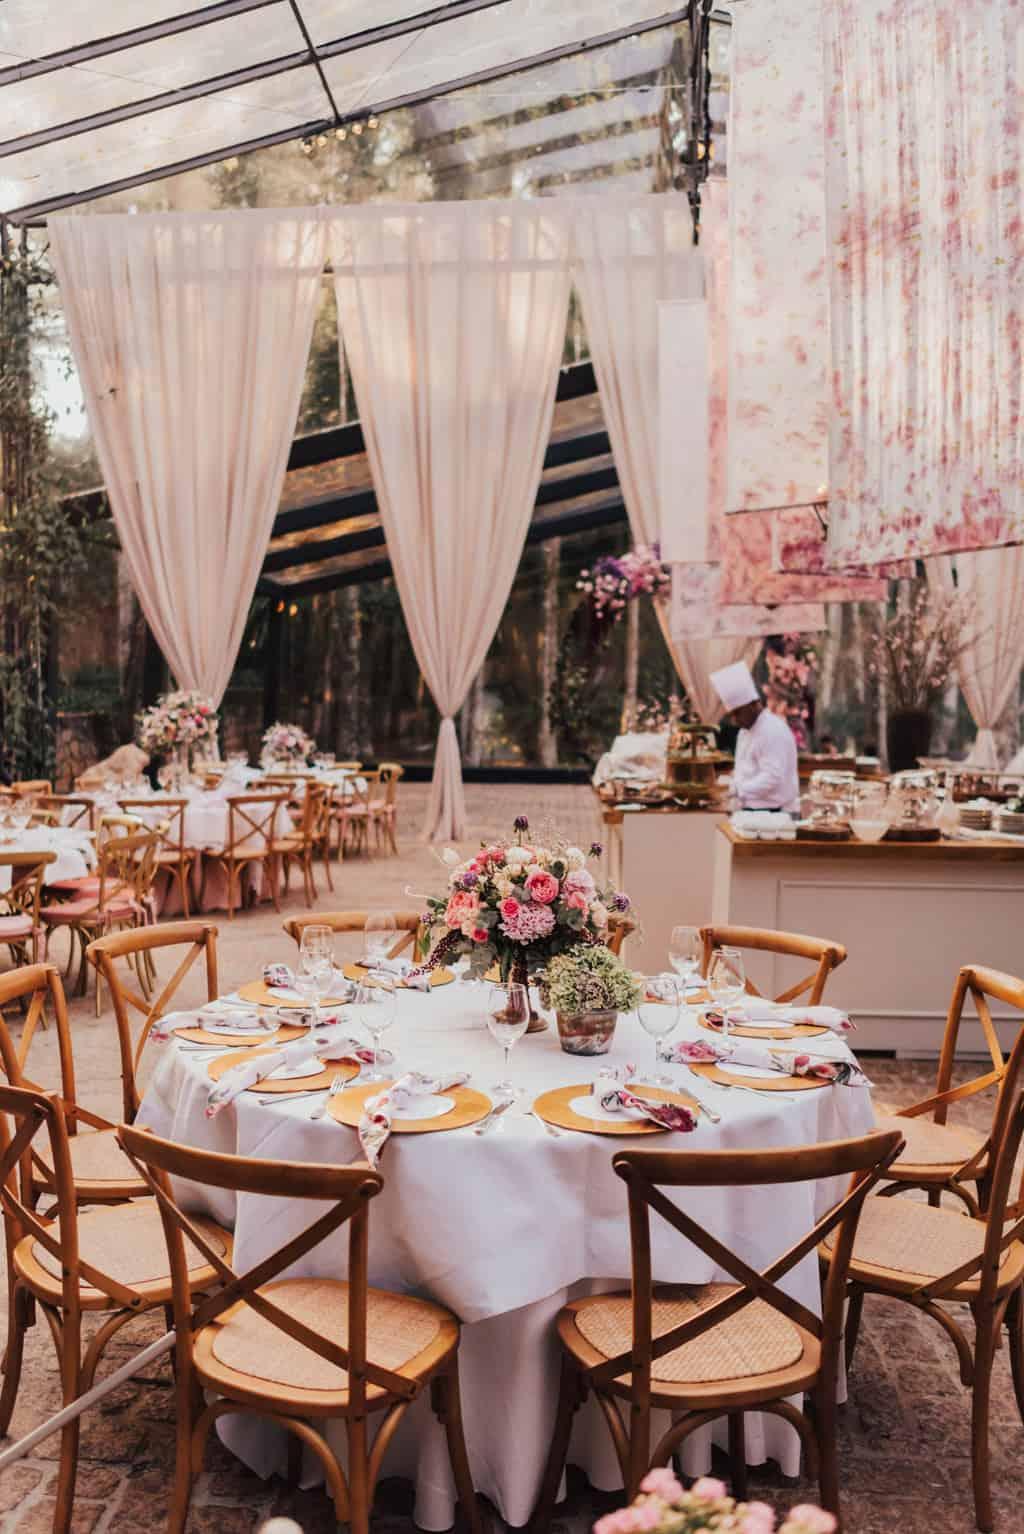 Boutique-de-Cena-casamento-Rebeca-e-Eldrey-Fazenda-Vila-Rica-Fotografia-Mana-Gollo-mesa-dos-convidados-Toda-de-Branco43